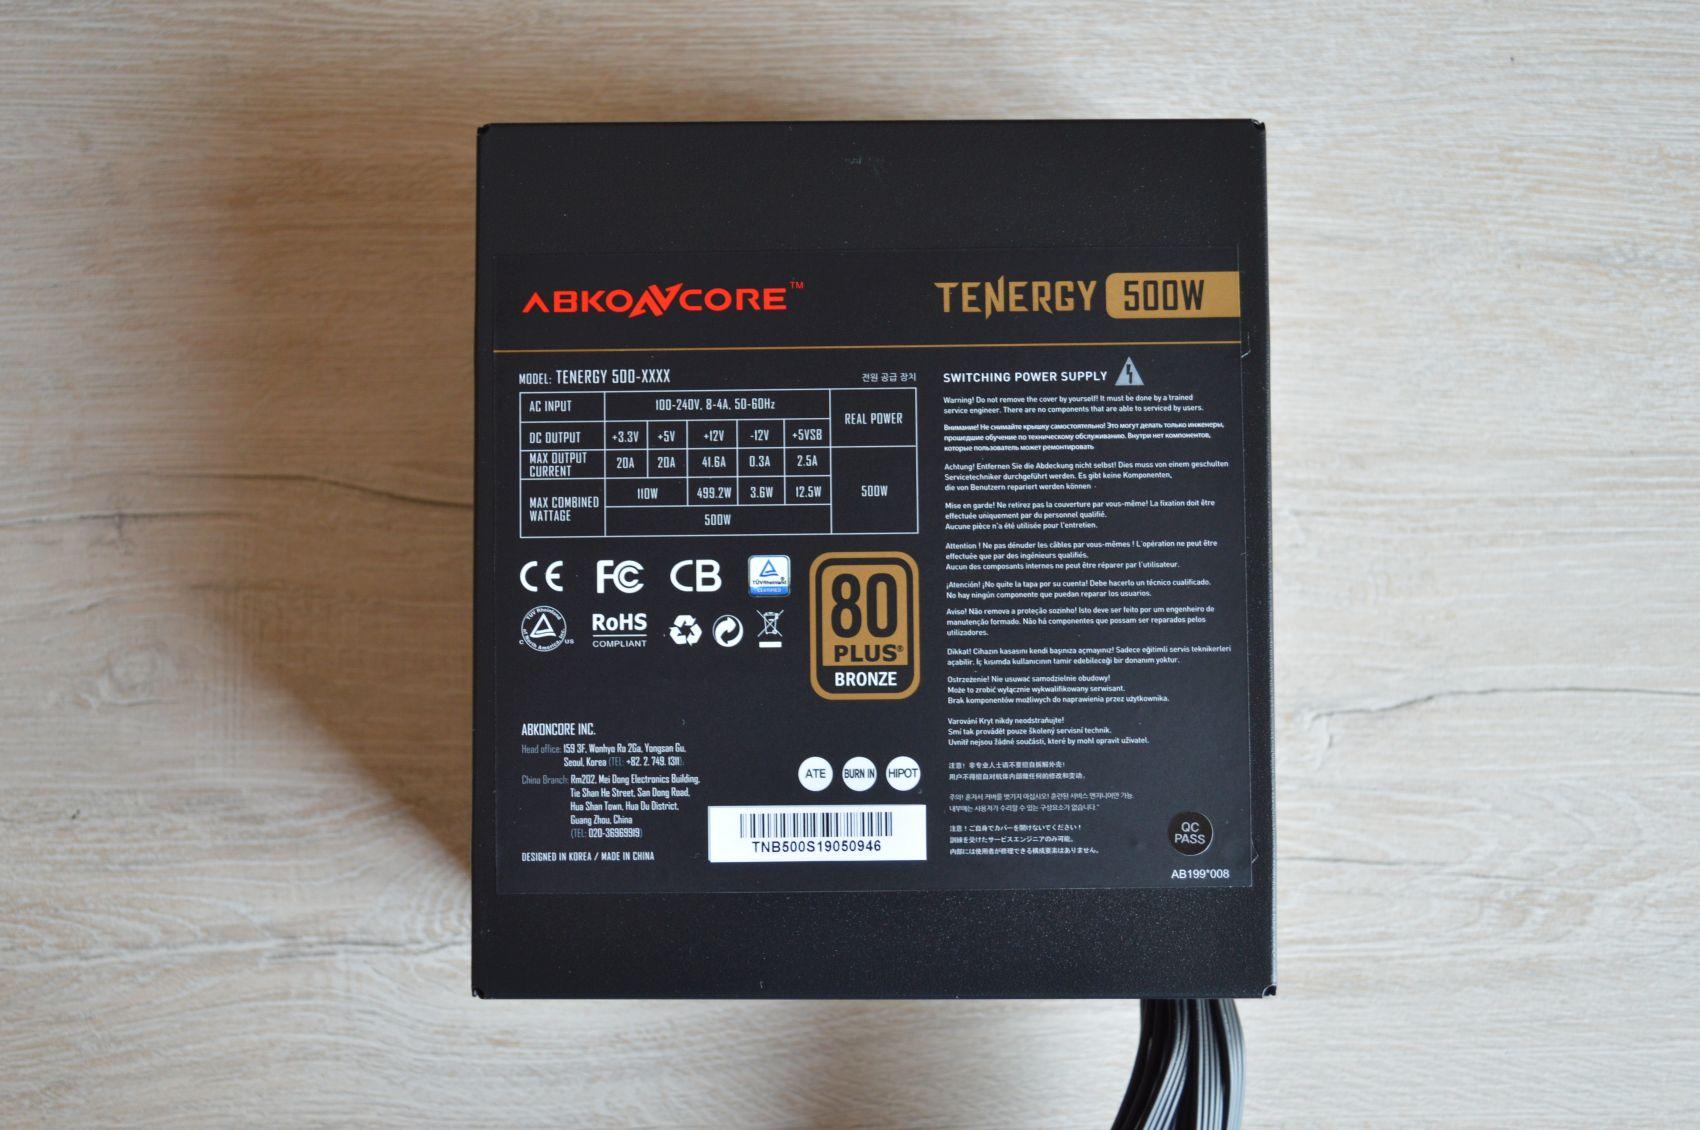 Abkoncore Tenergy 500W наклейка с данными